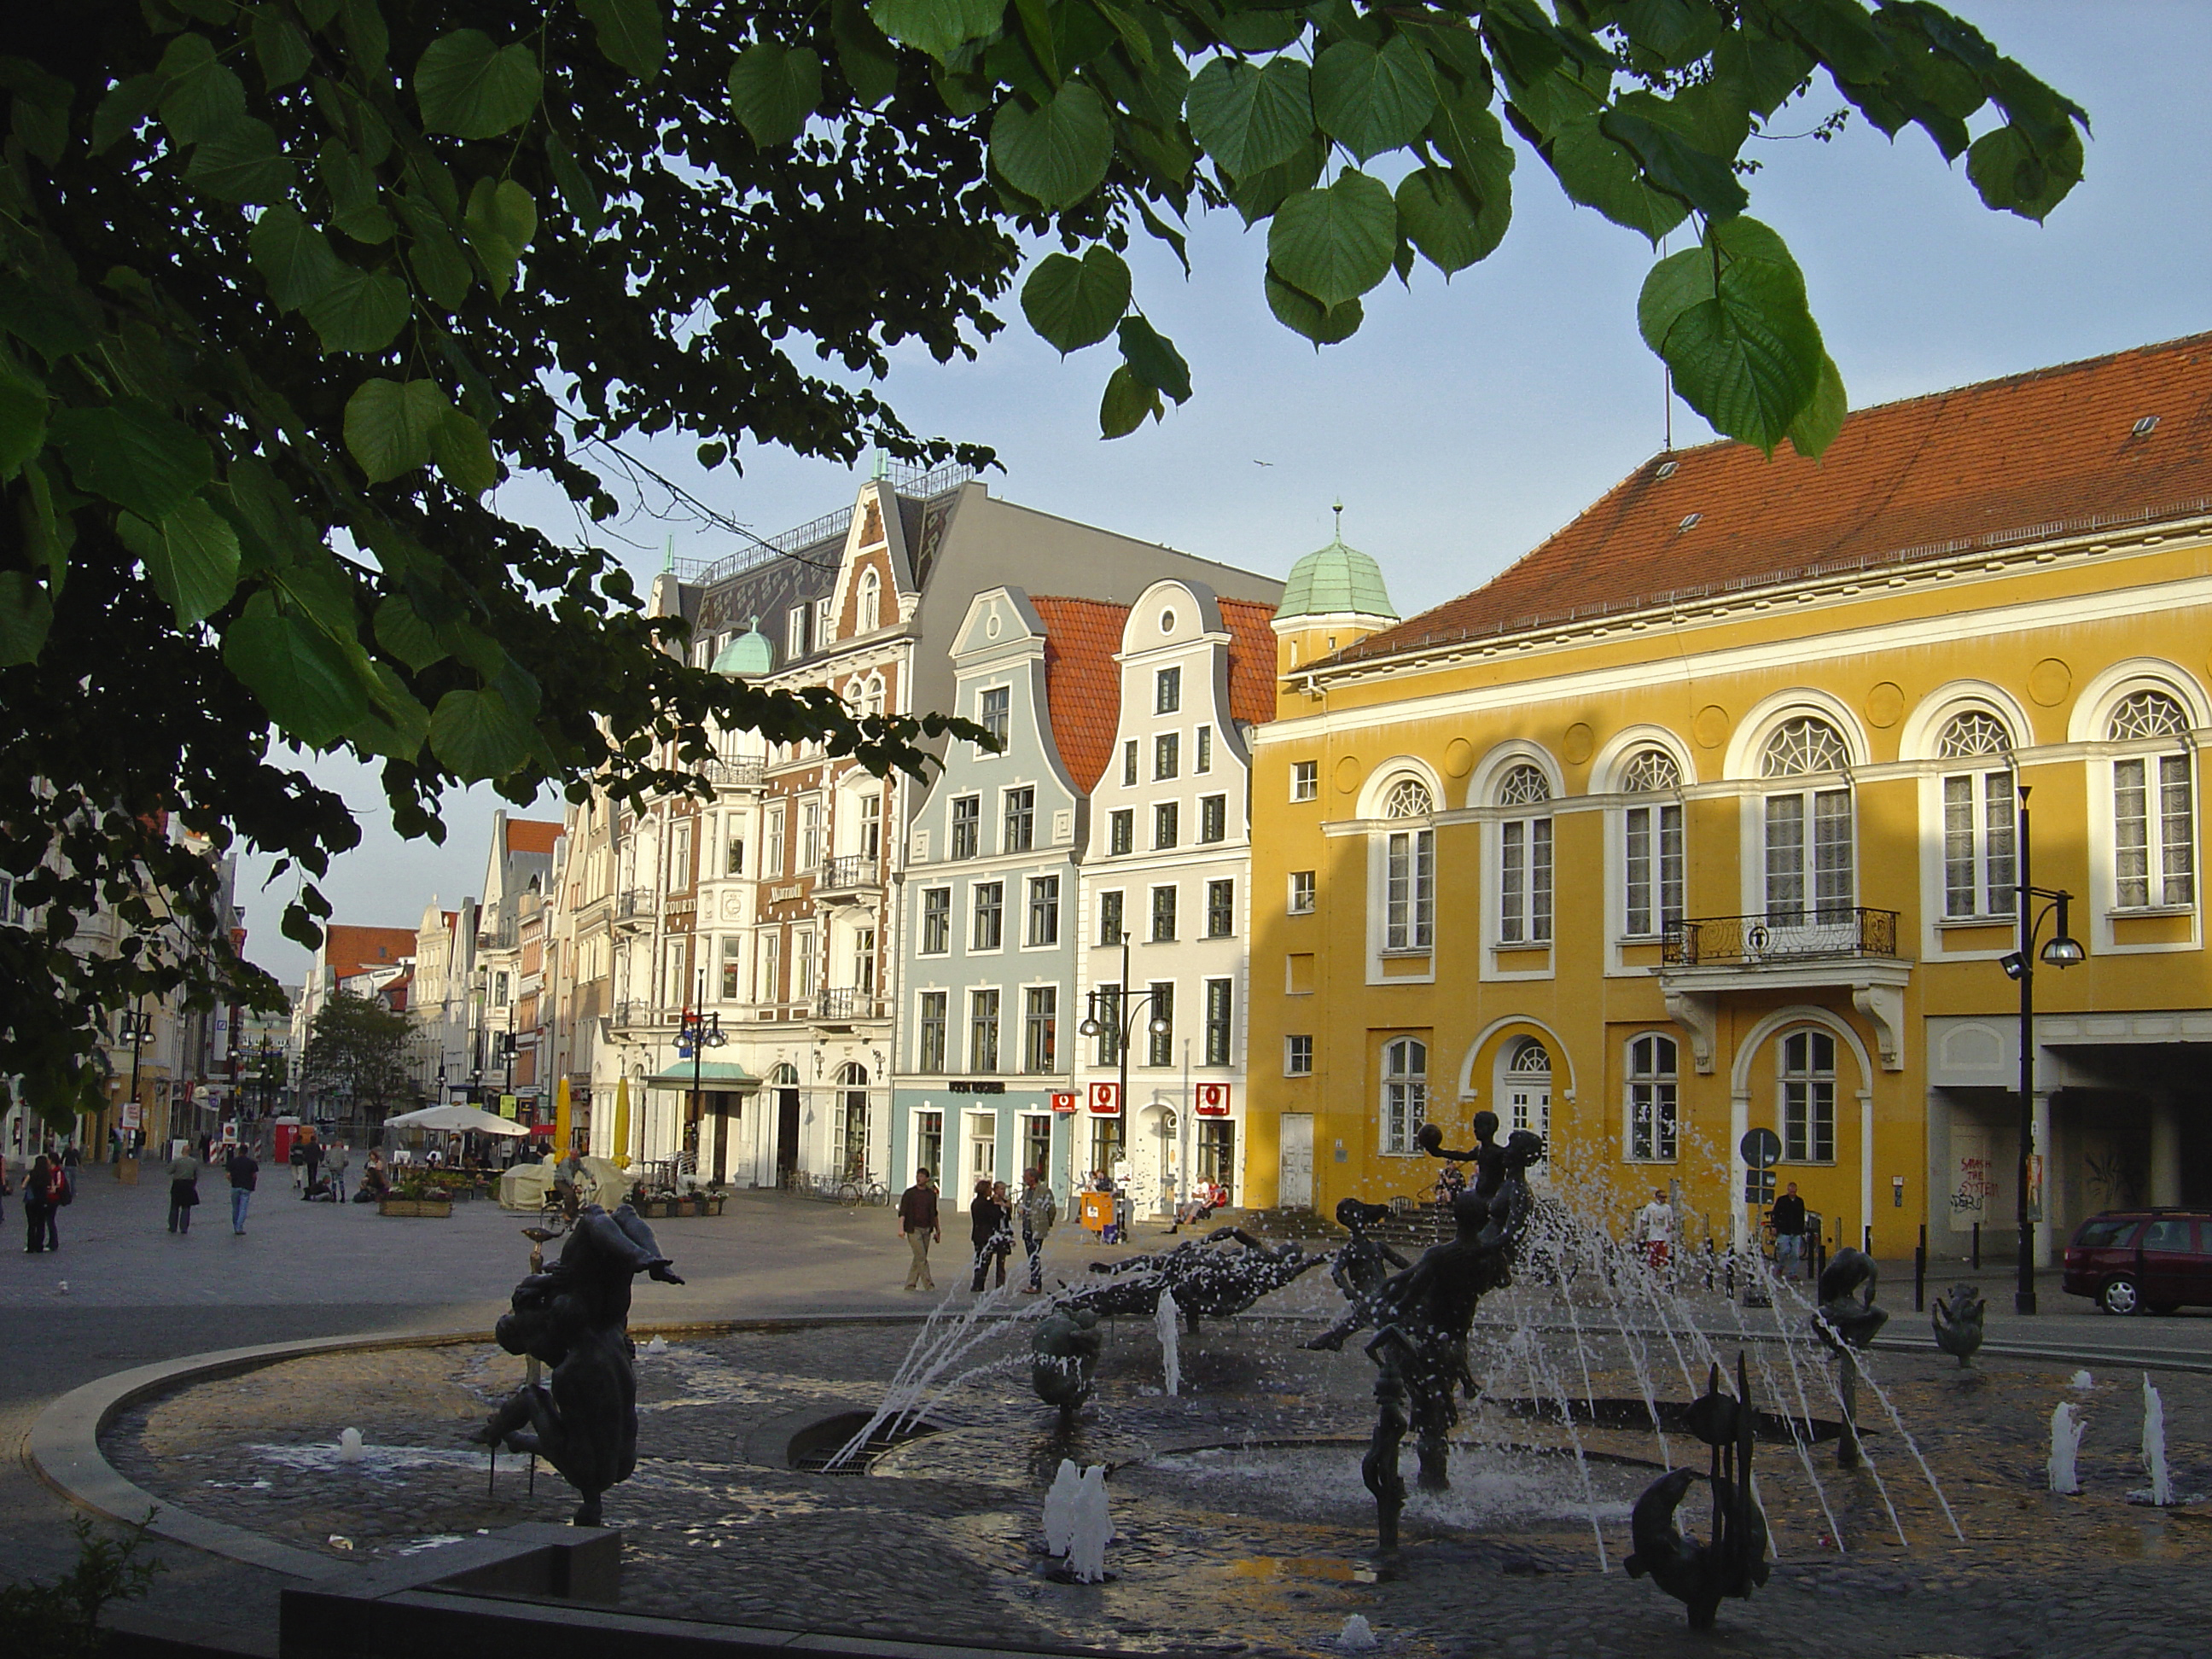 Rostock Stadtmitte